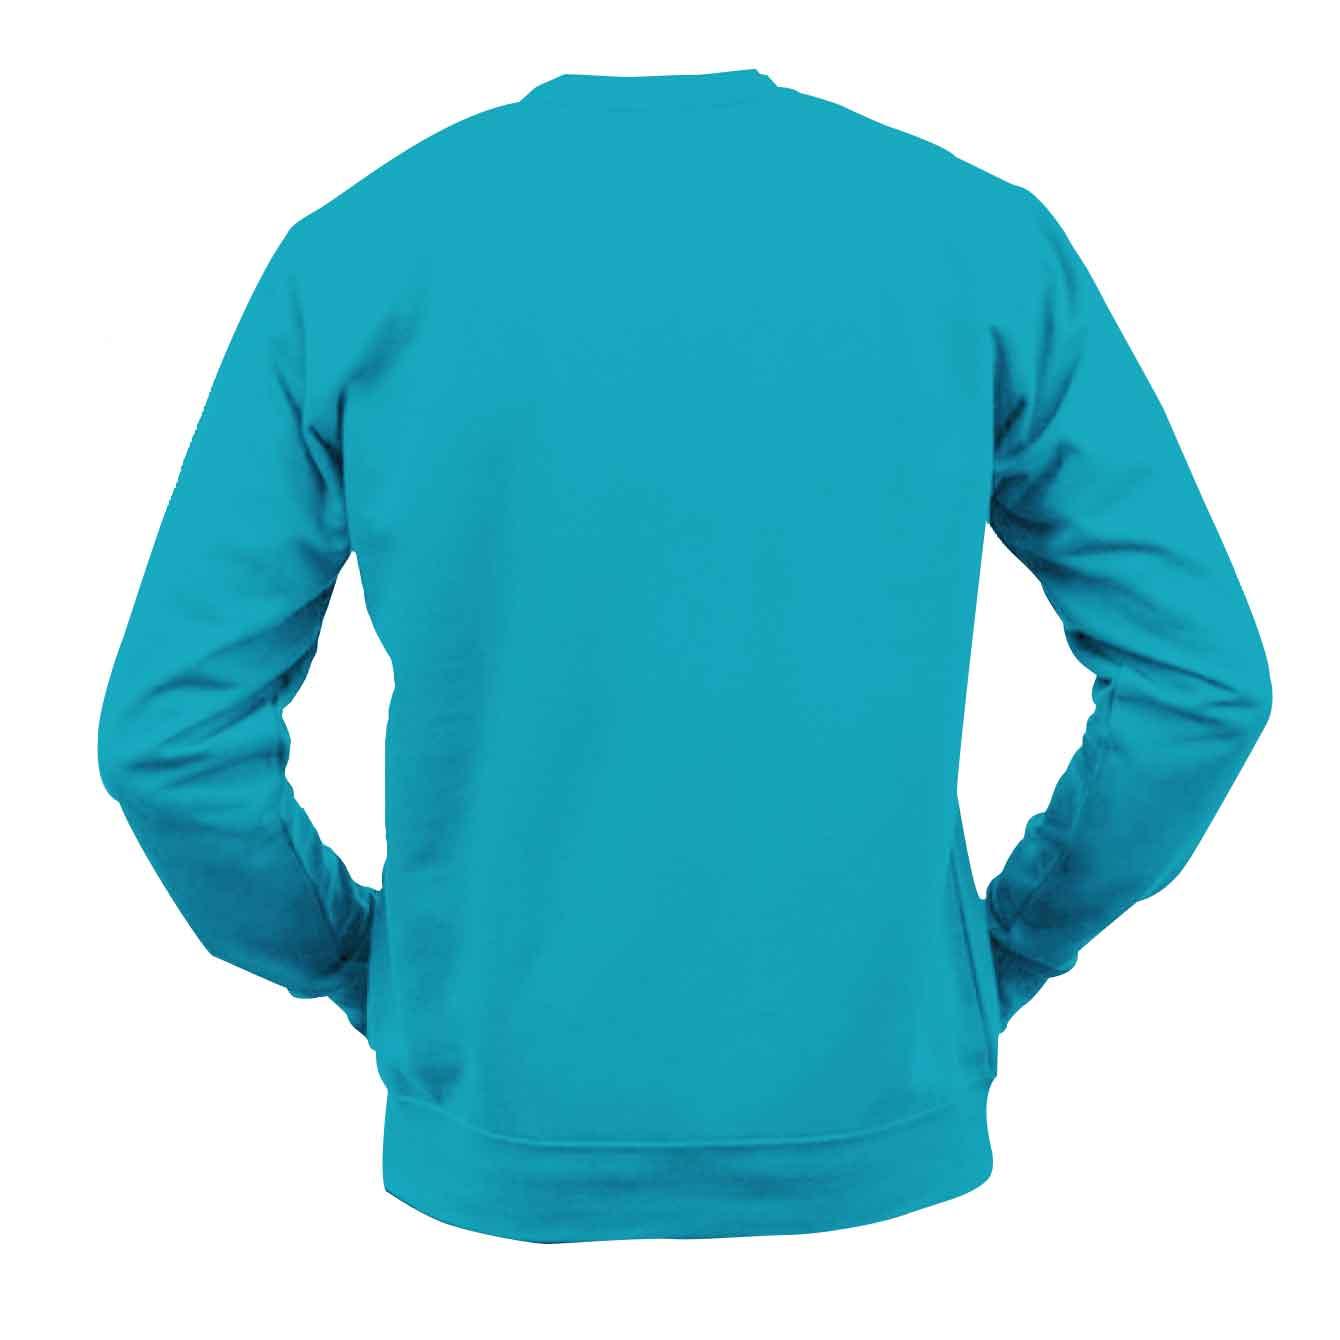 05_jh030_turquoise--0-0--d12fe056-f744-4a70-83e3-3ecc22b58be1